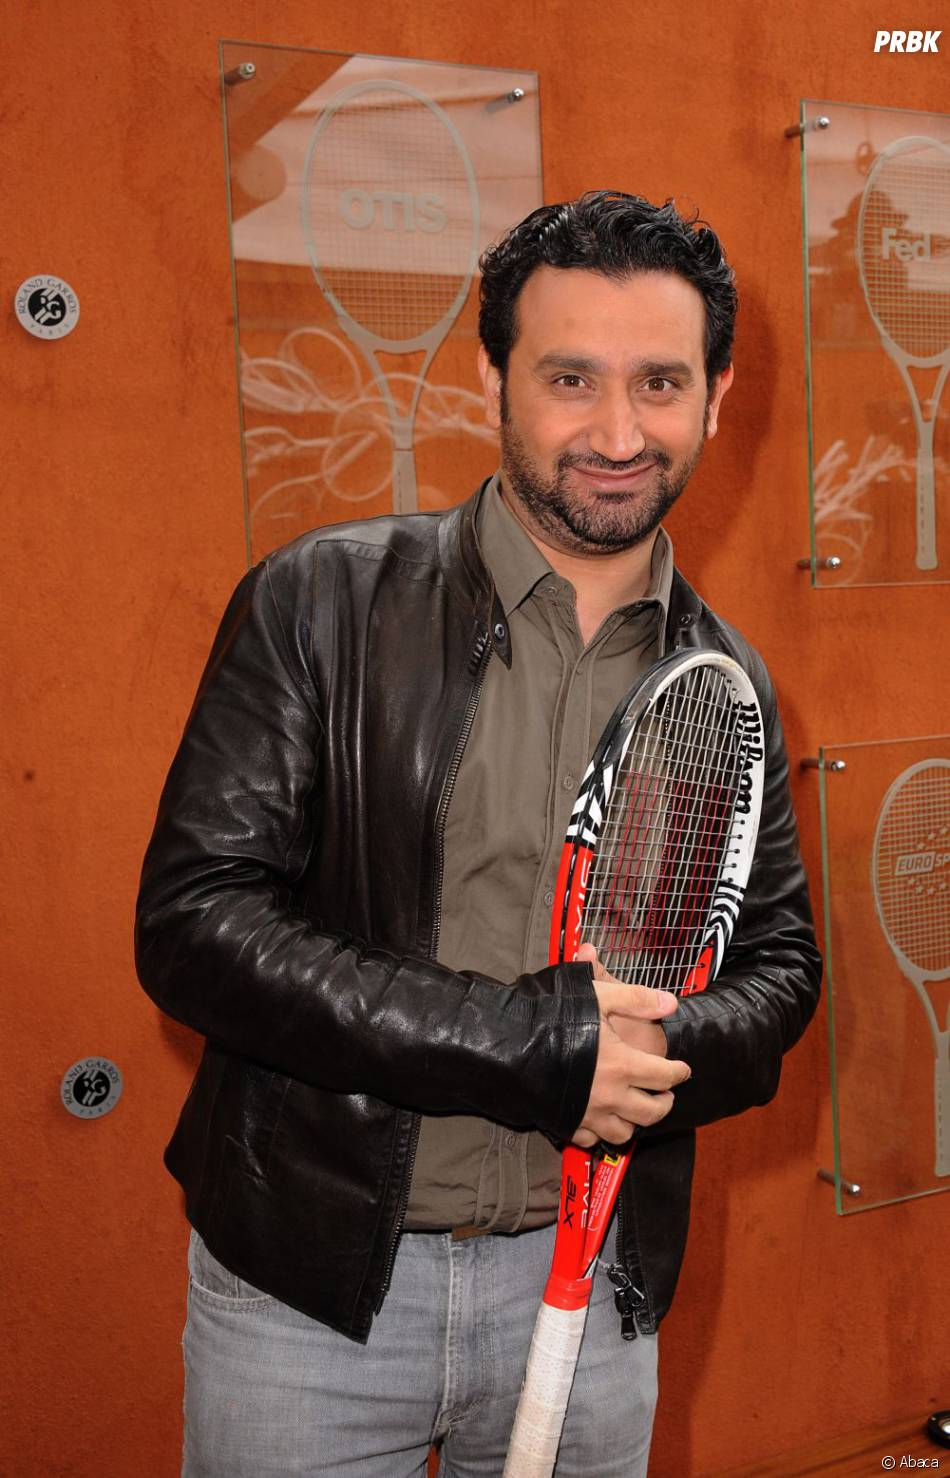 Cyril Hanouna envisage-t-il de quitter Virgin radio ?